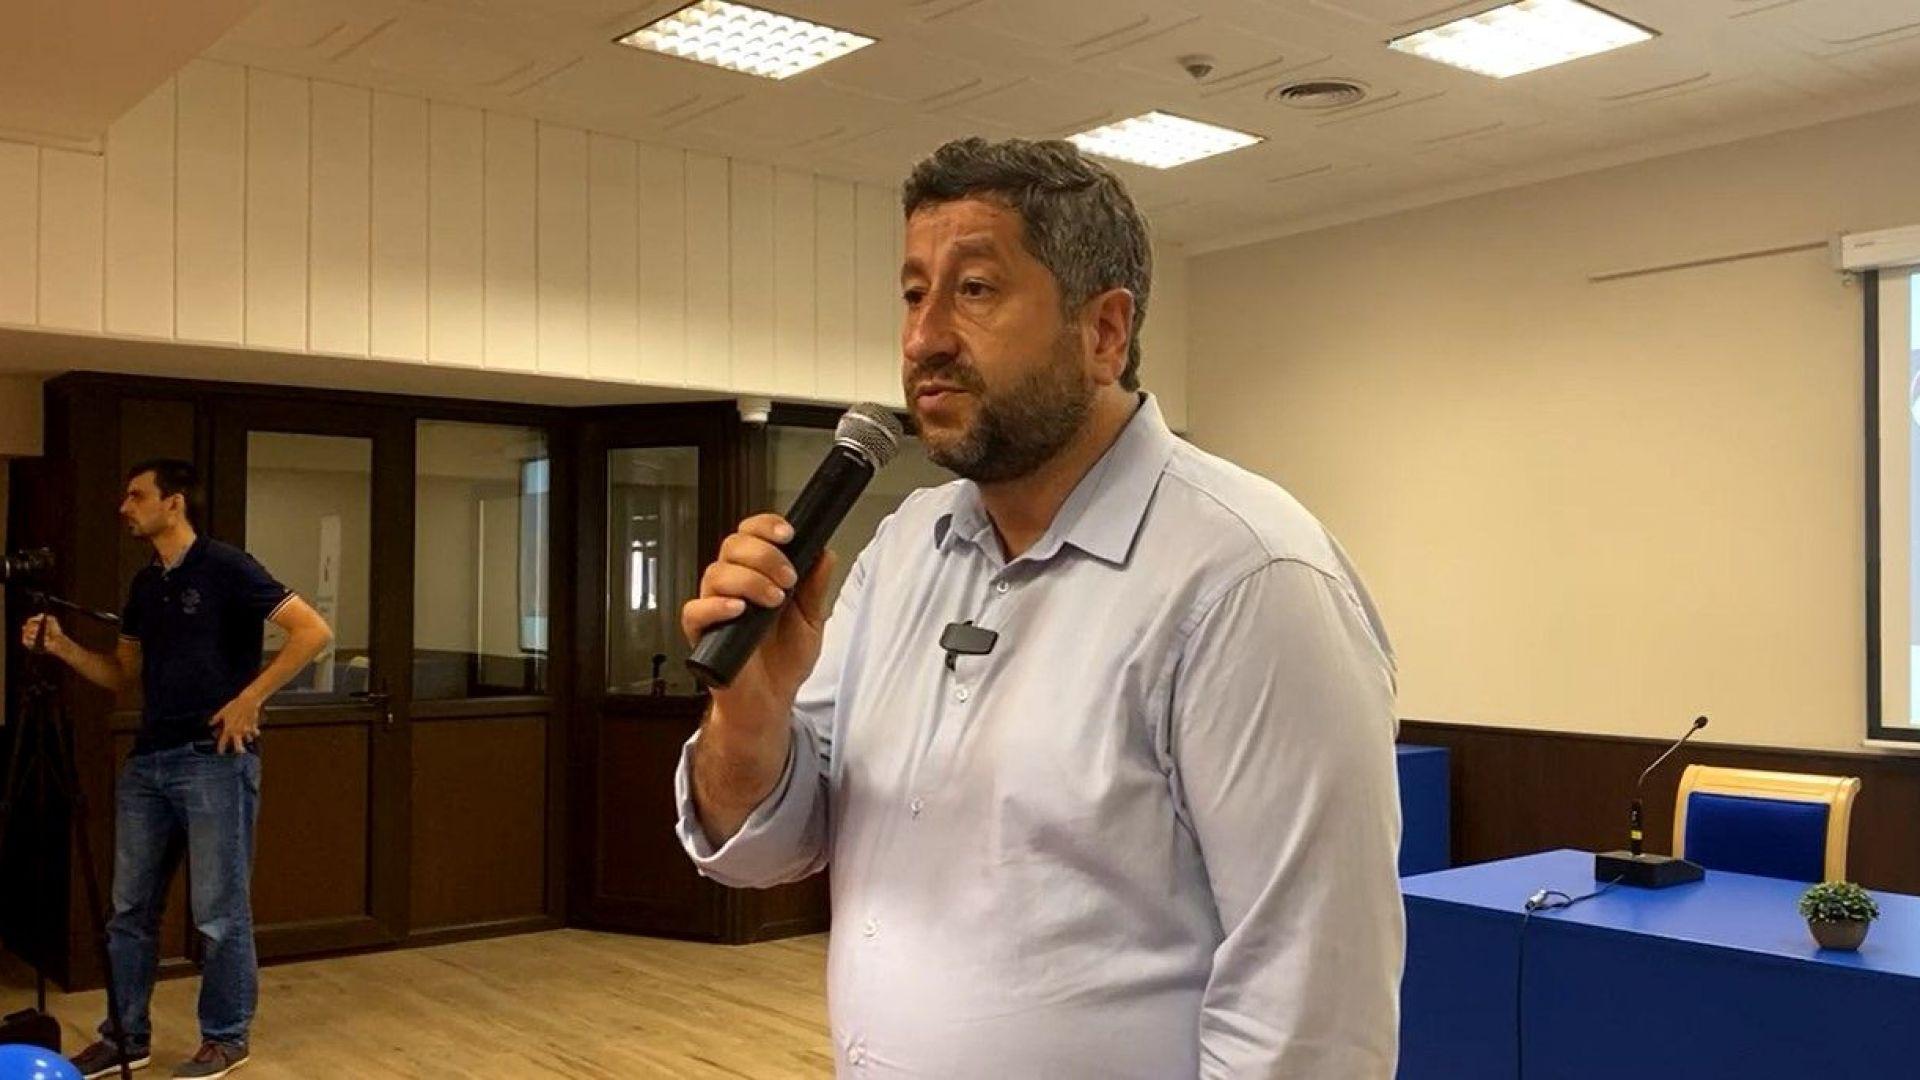 Христо Иванов: Целим да стигнем средните за Европа доходи в рамките на 4-5 години